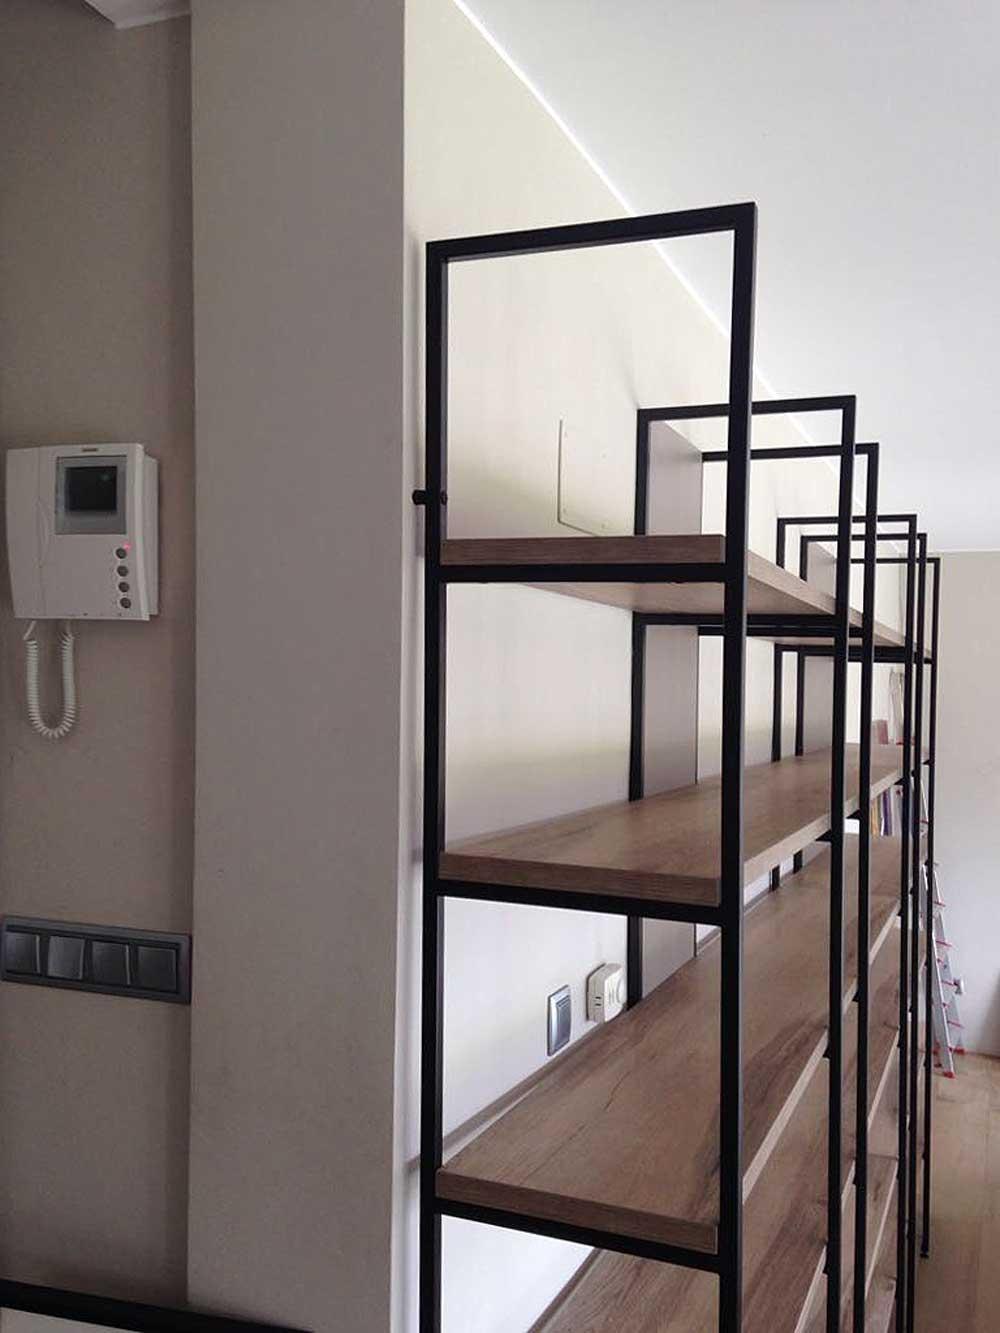 Cristina font proyecta apartamento con estanteria olut olut - Estanterias metalicas modulares ...